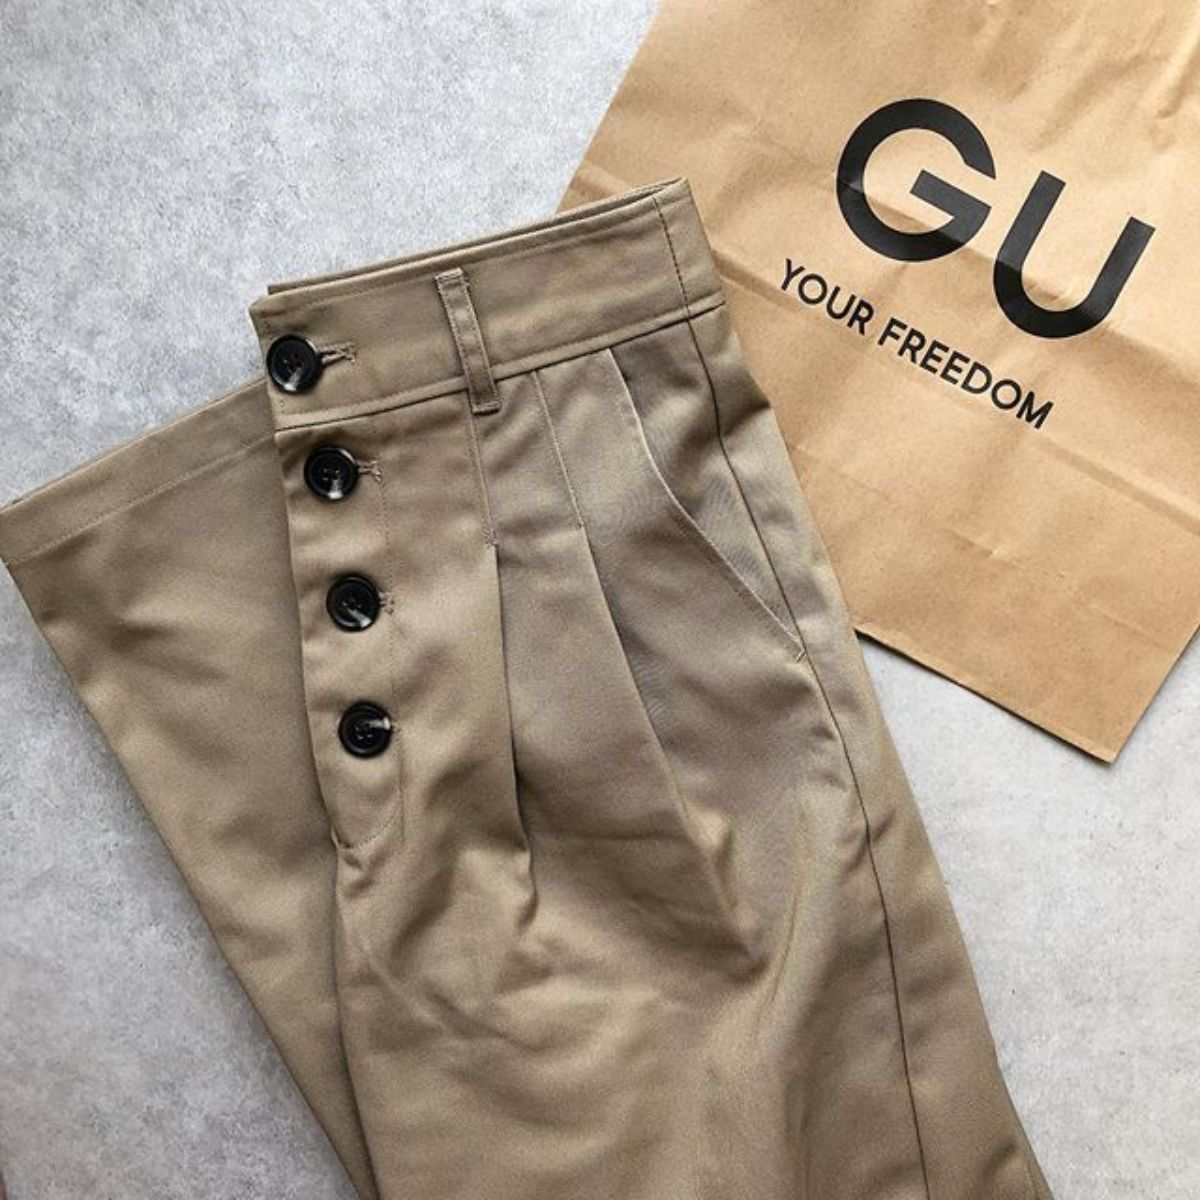 GUで今だけ990円の「チノハイウエストボタンワイドパンツ」がかわいい!カジュアルコーデに万能なんです◎